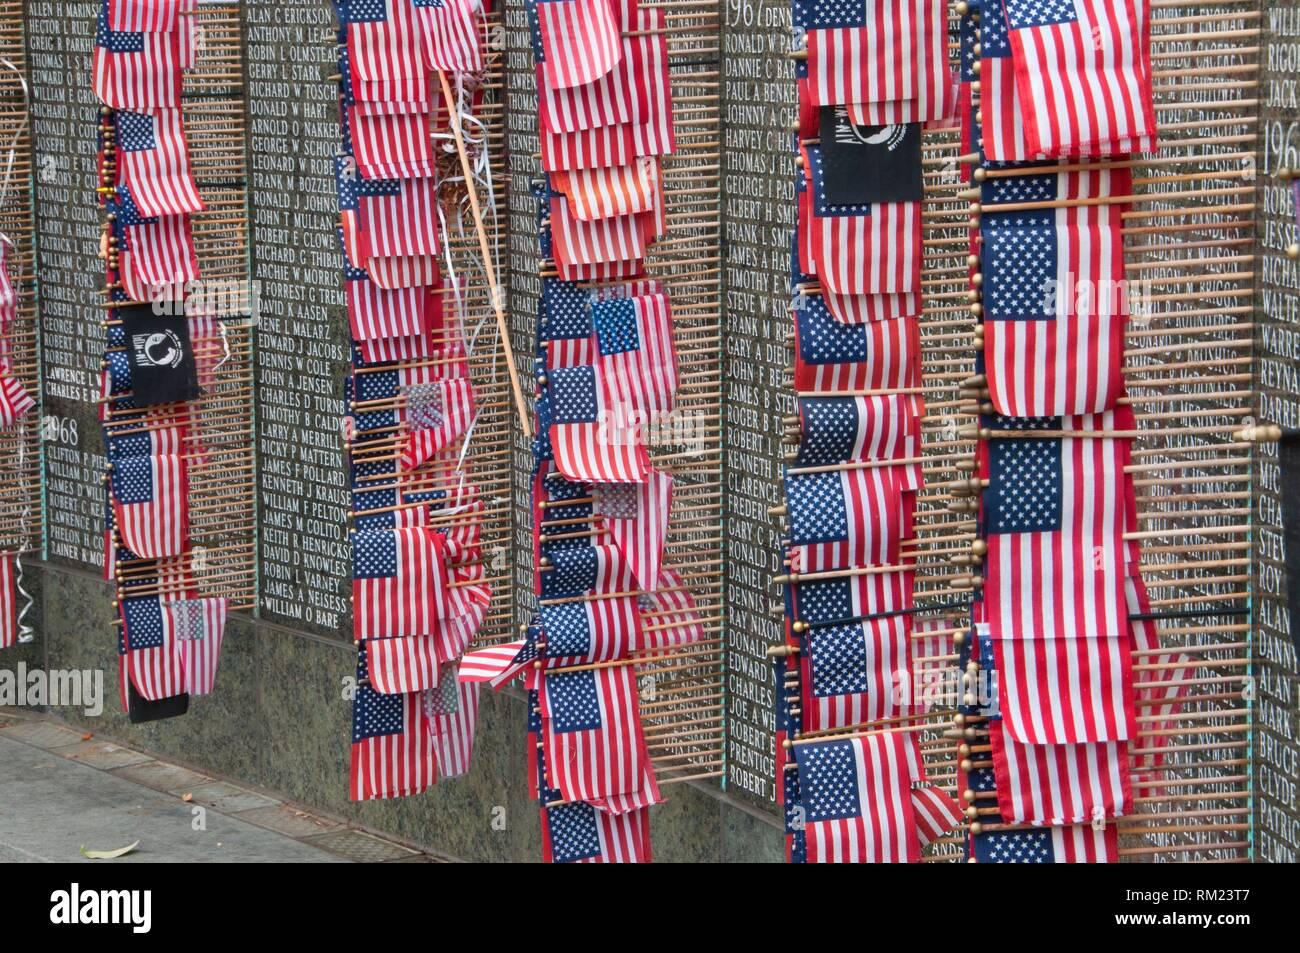 Washington Vietnam Veterans Memorial with American flag, State Capitol Mall, Olympia, Washington. - Stock Image